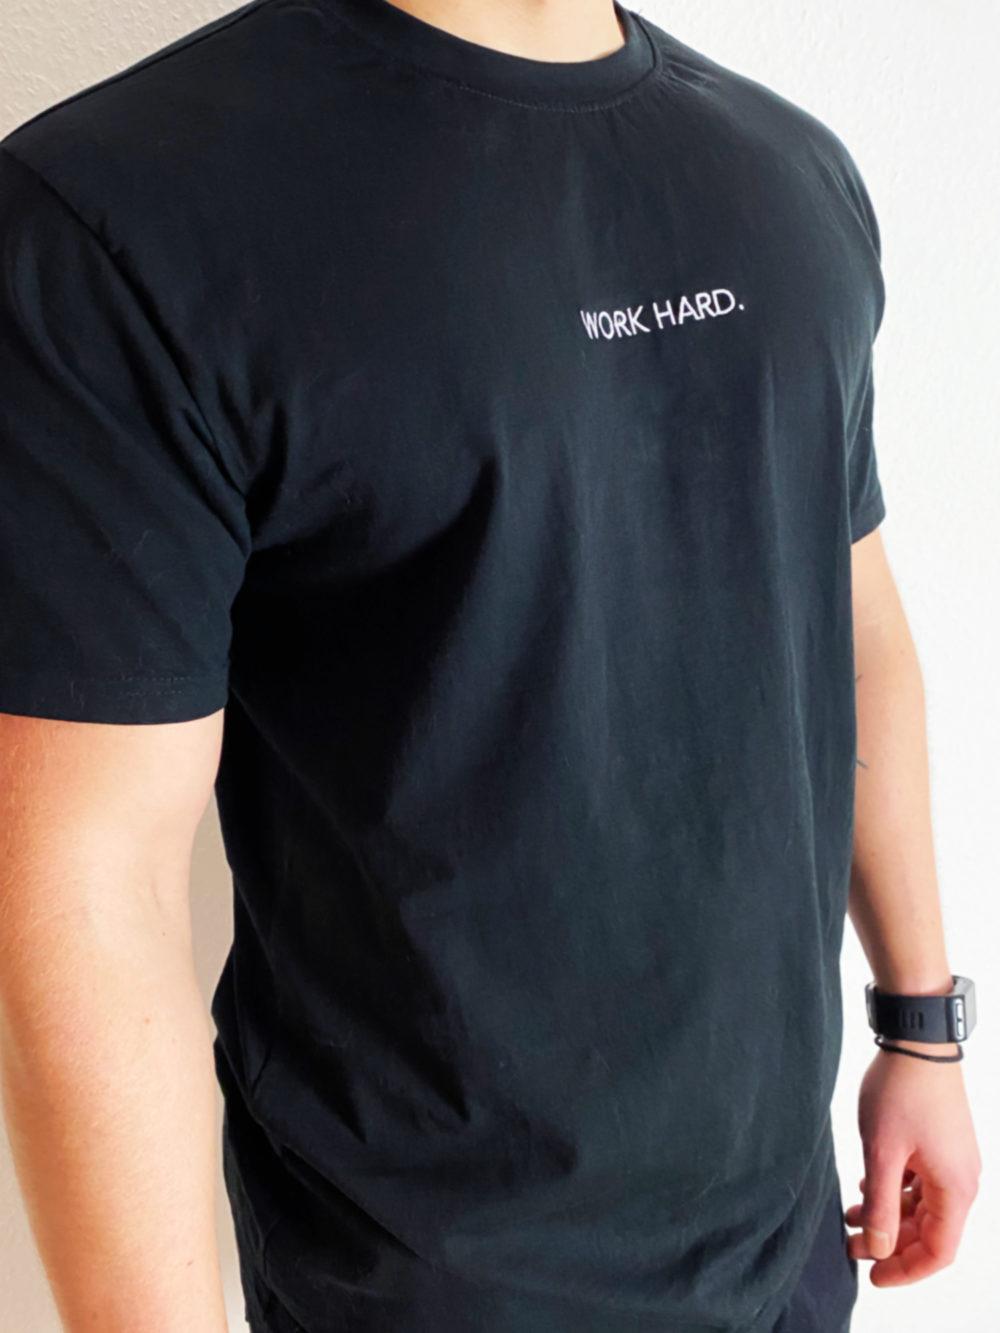 oversize Shirt Männer Stick Statement Work hard